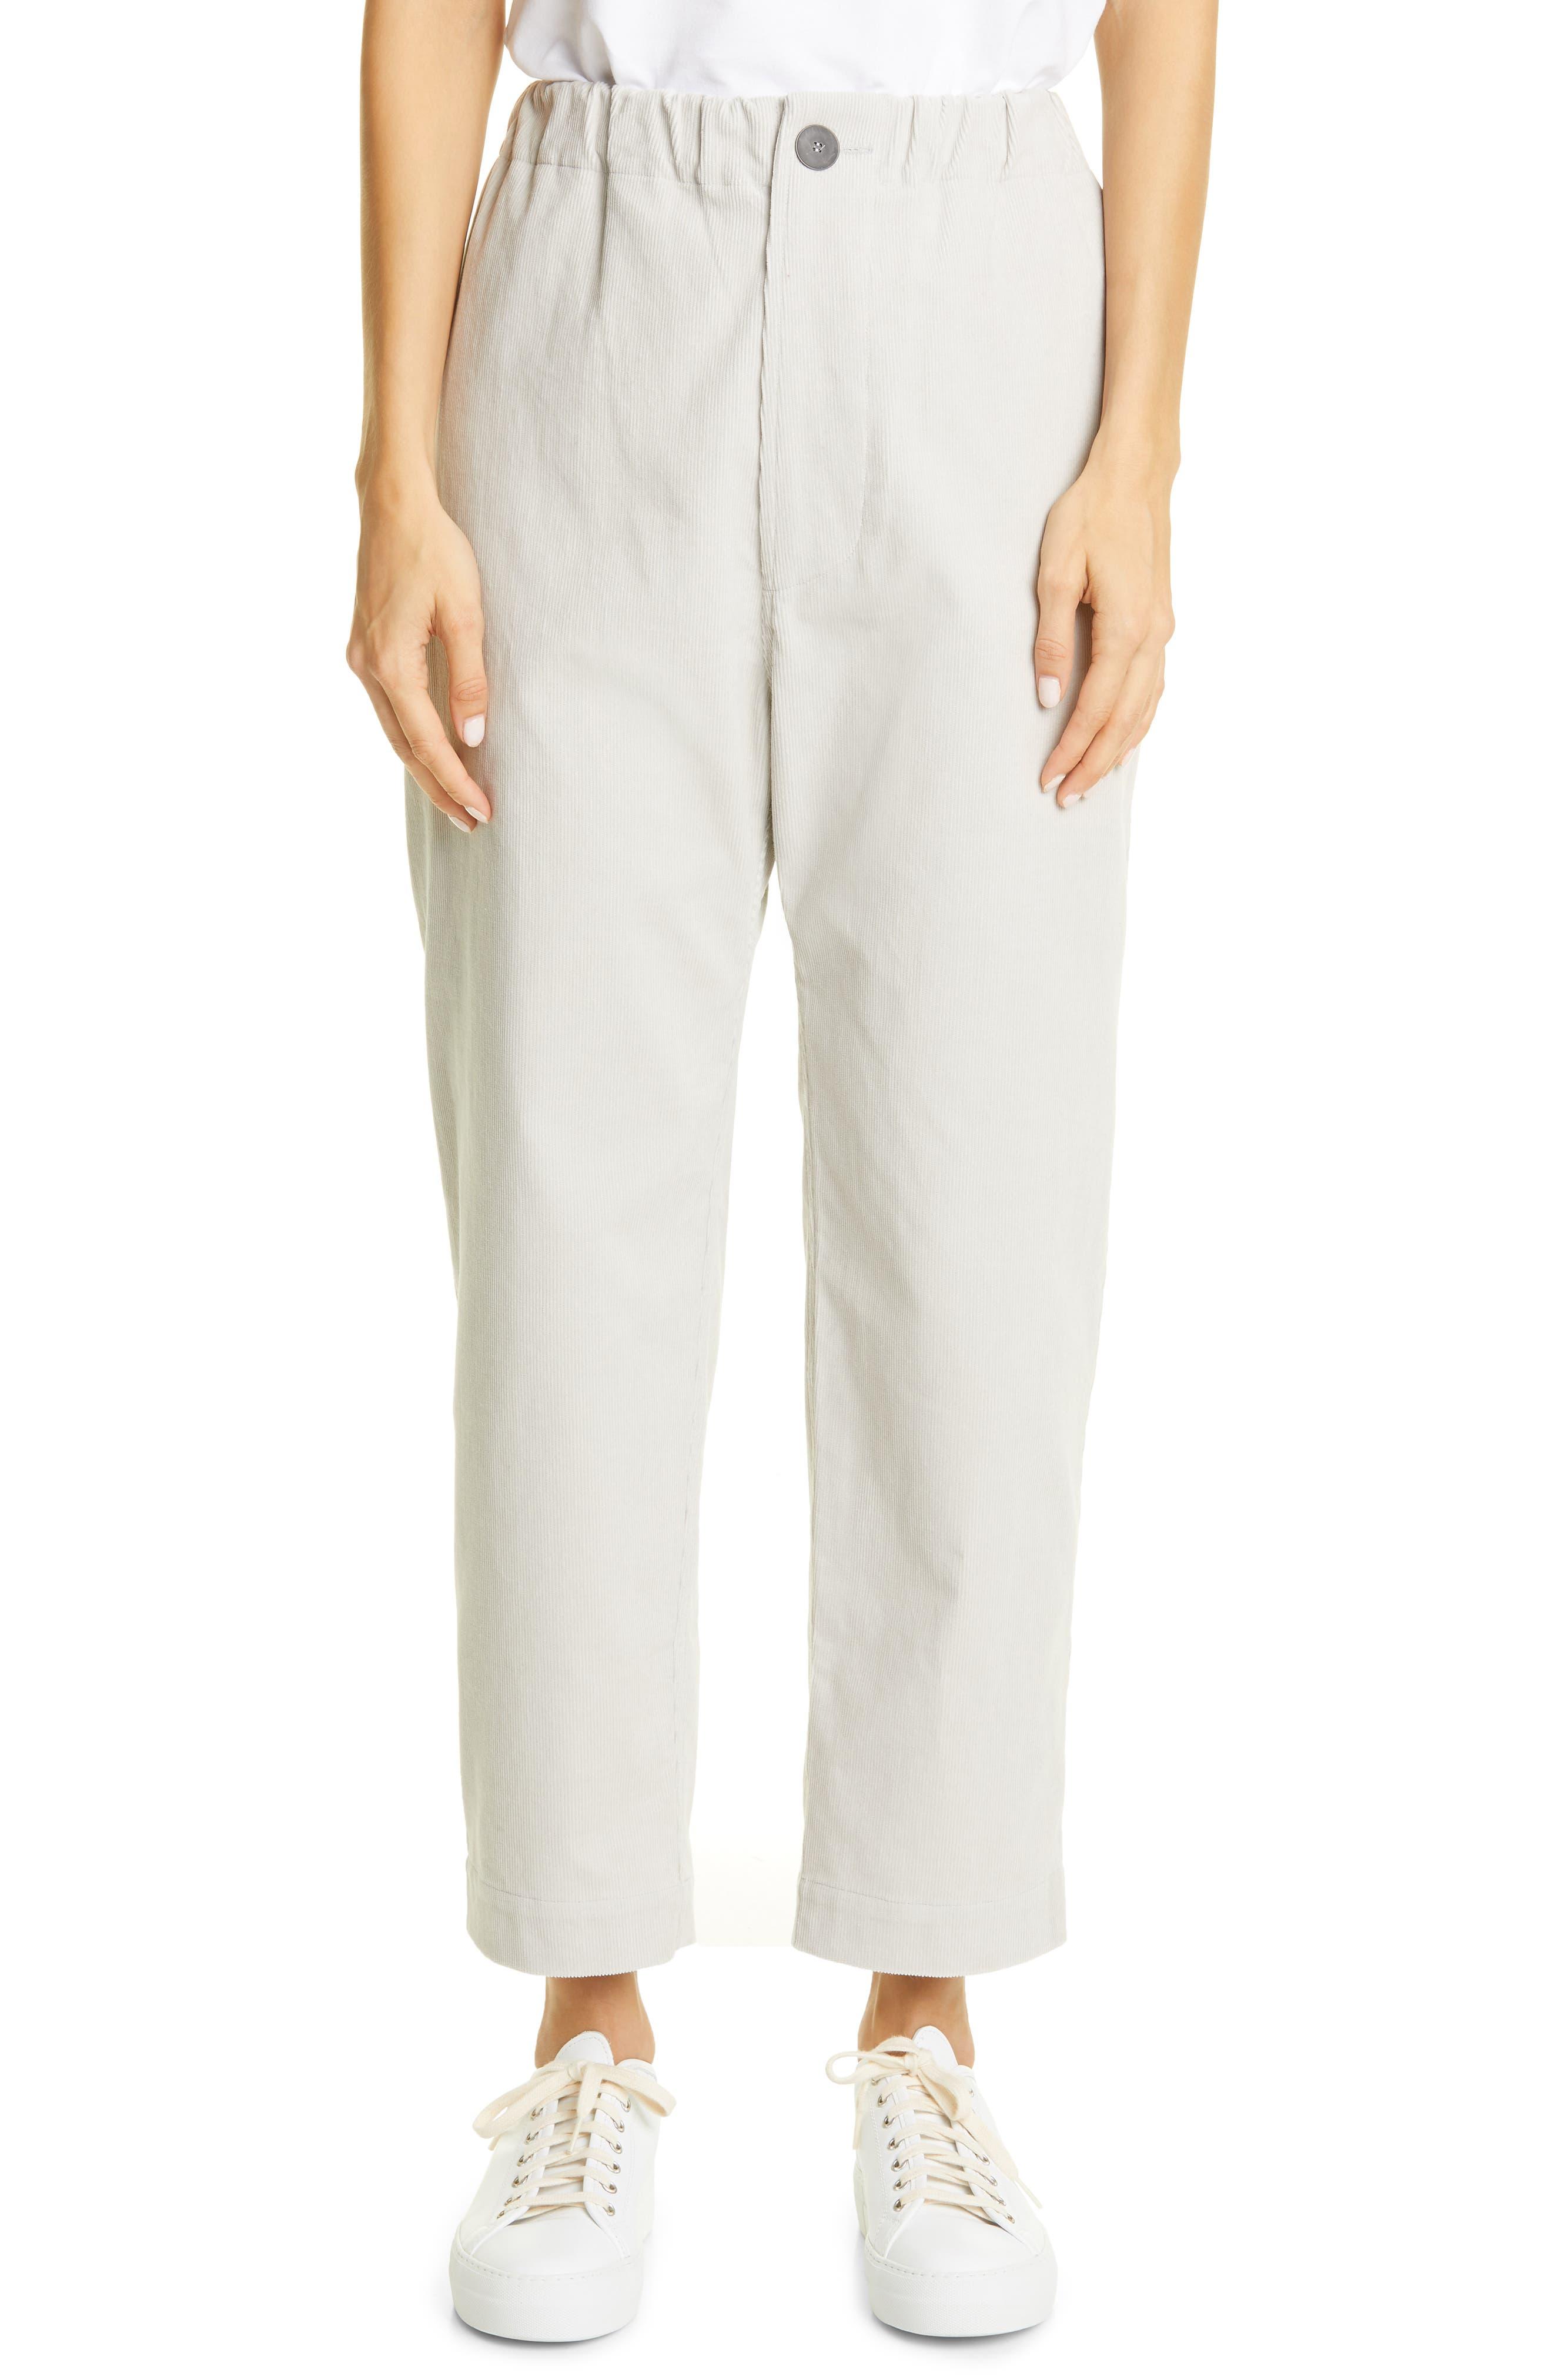 Sofie D'Hoore Crop Straight Leg Corduroy Pants | Nordstrom